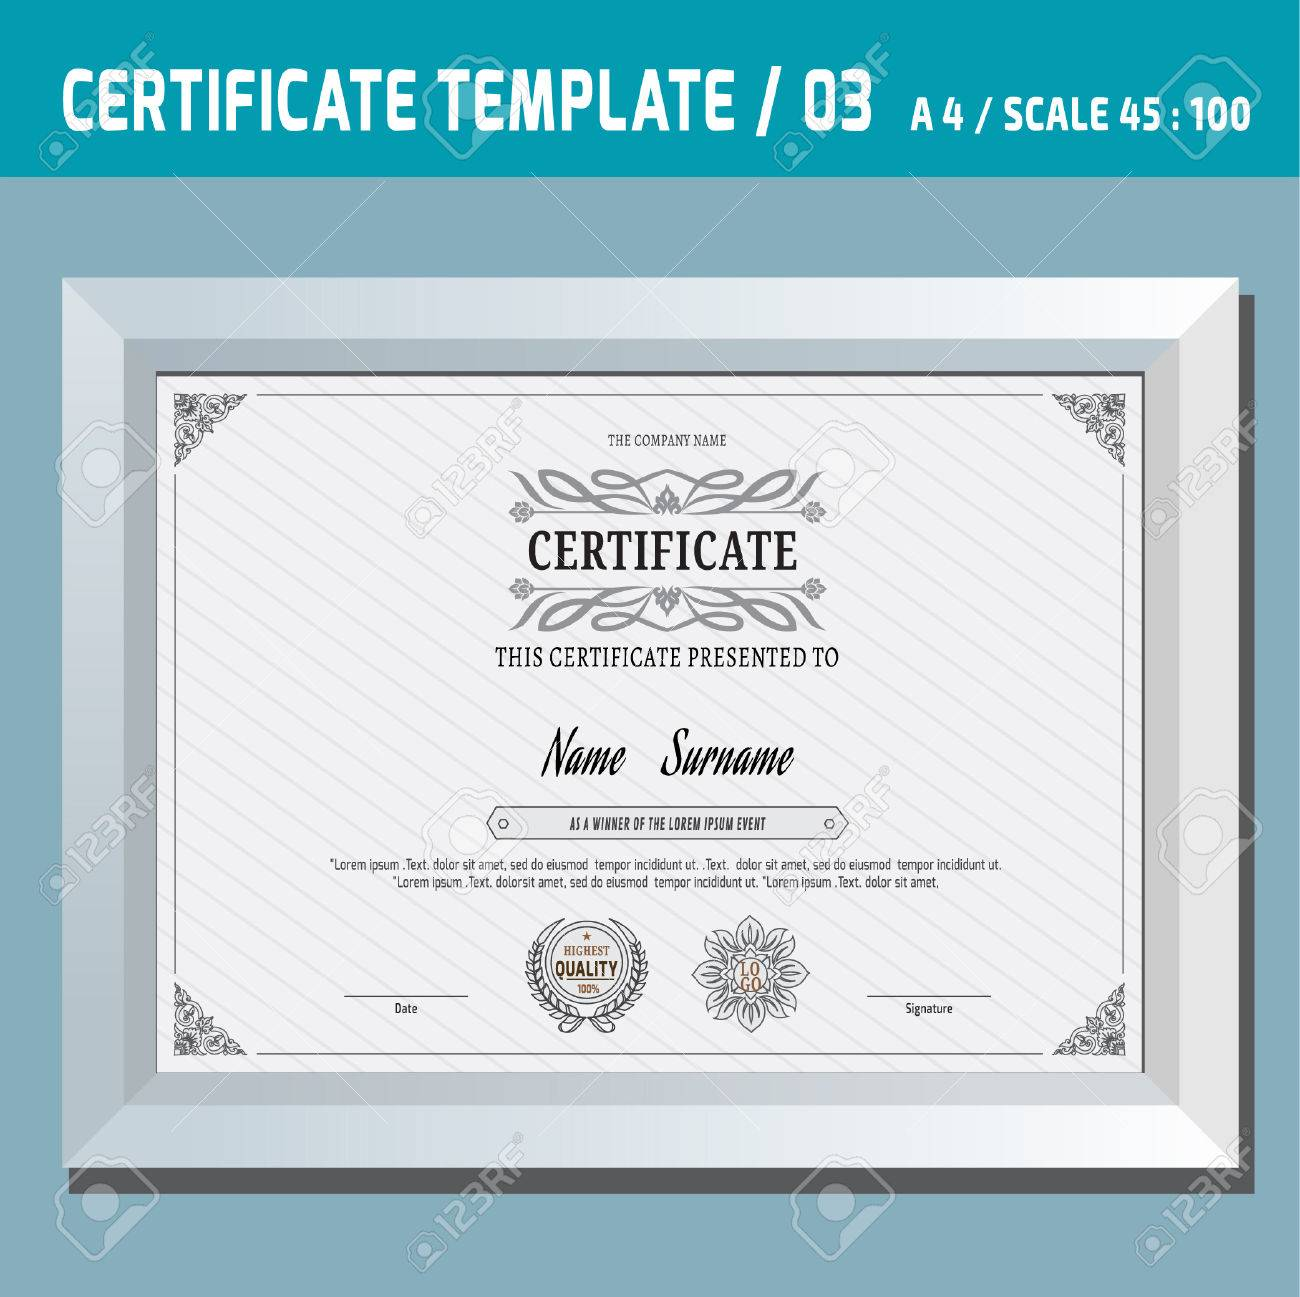 Certificate templatea4eyctor design templatentage retro certificate templatea4eyctor design templatentage retro frame diploma background yadclub Choice Image